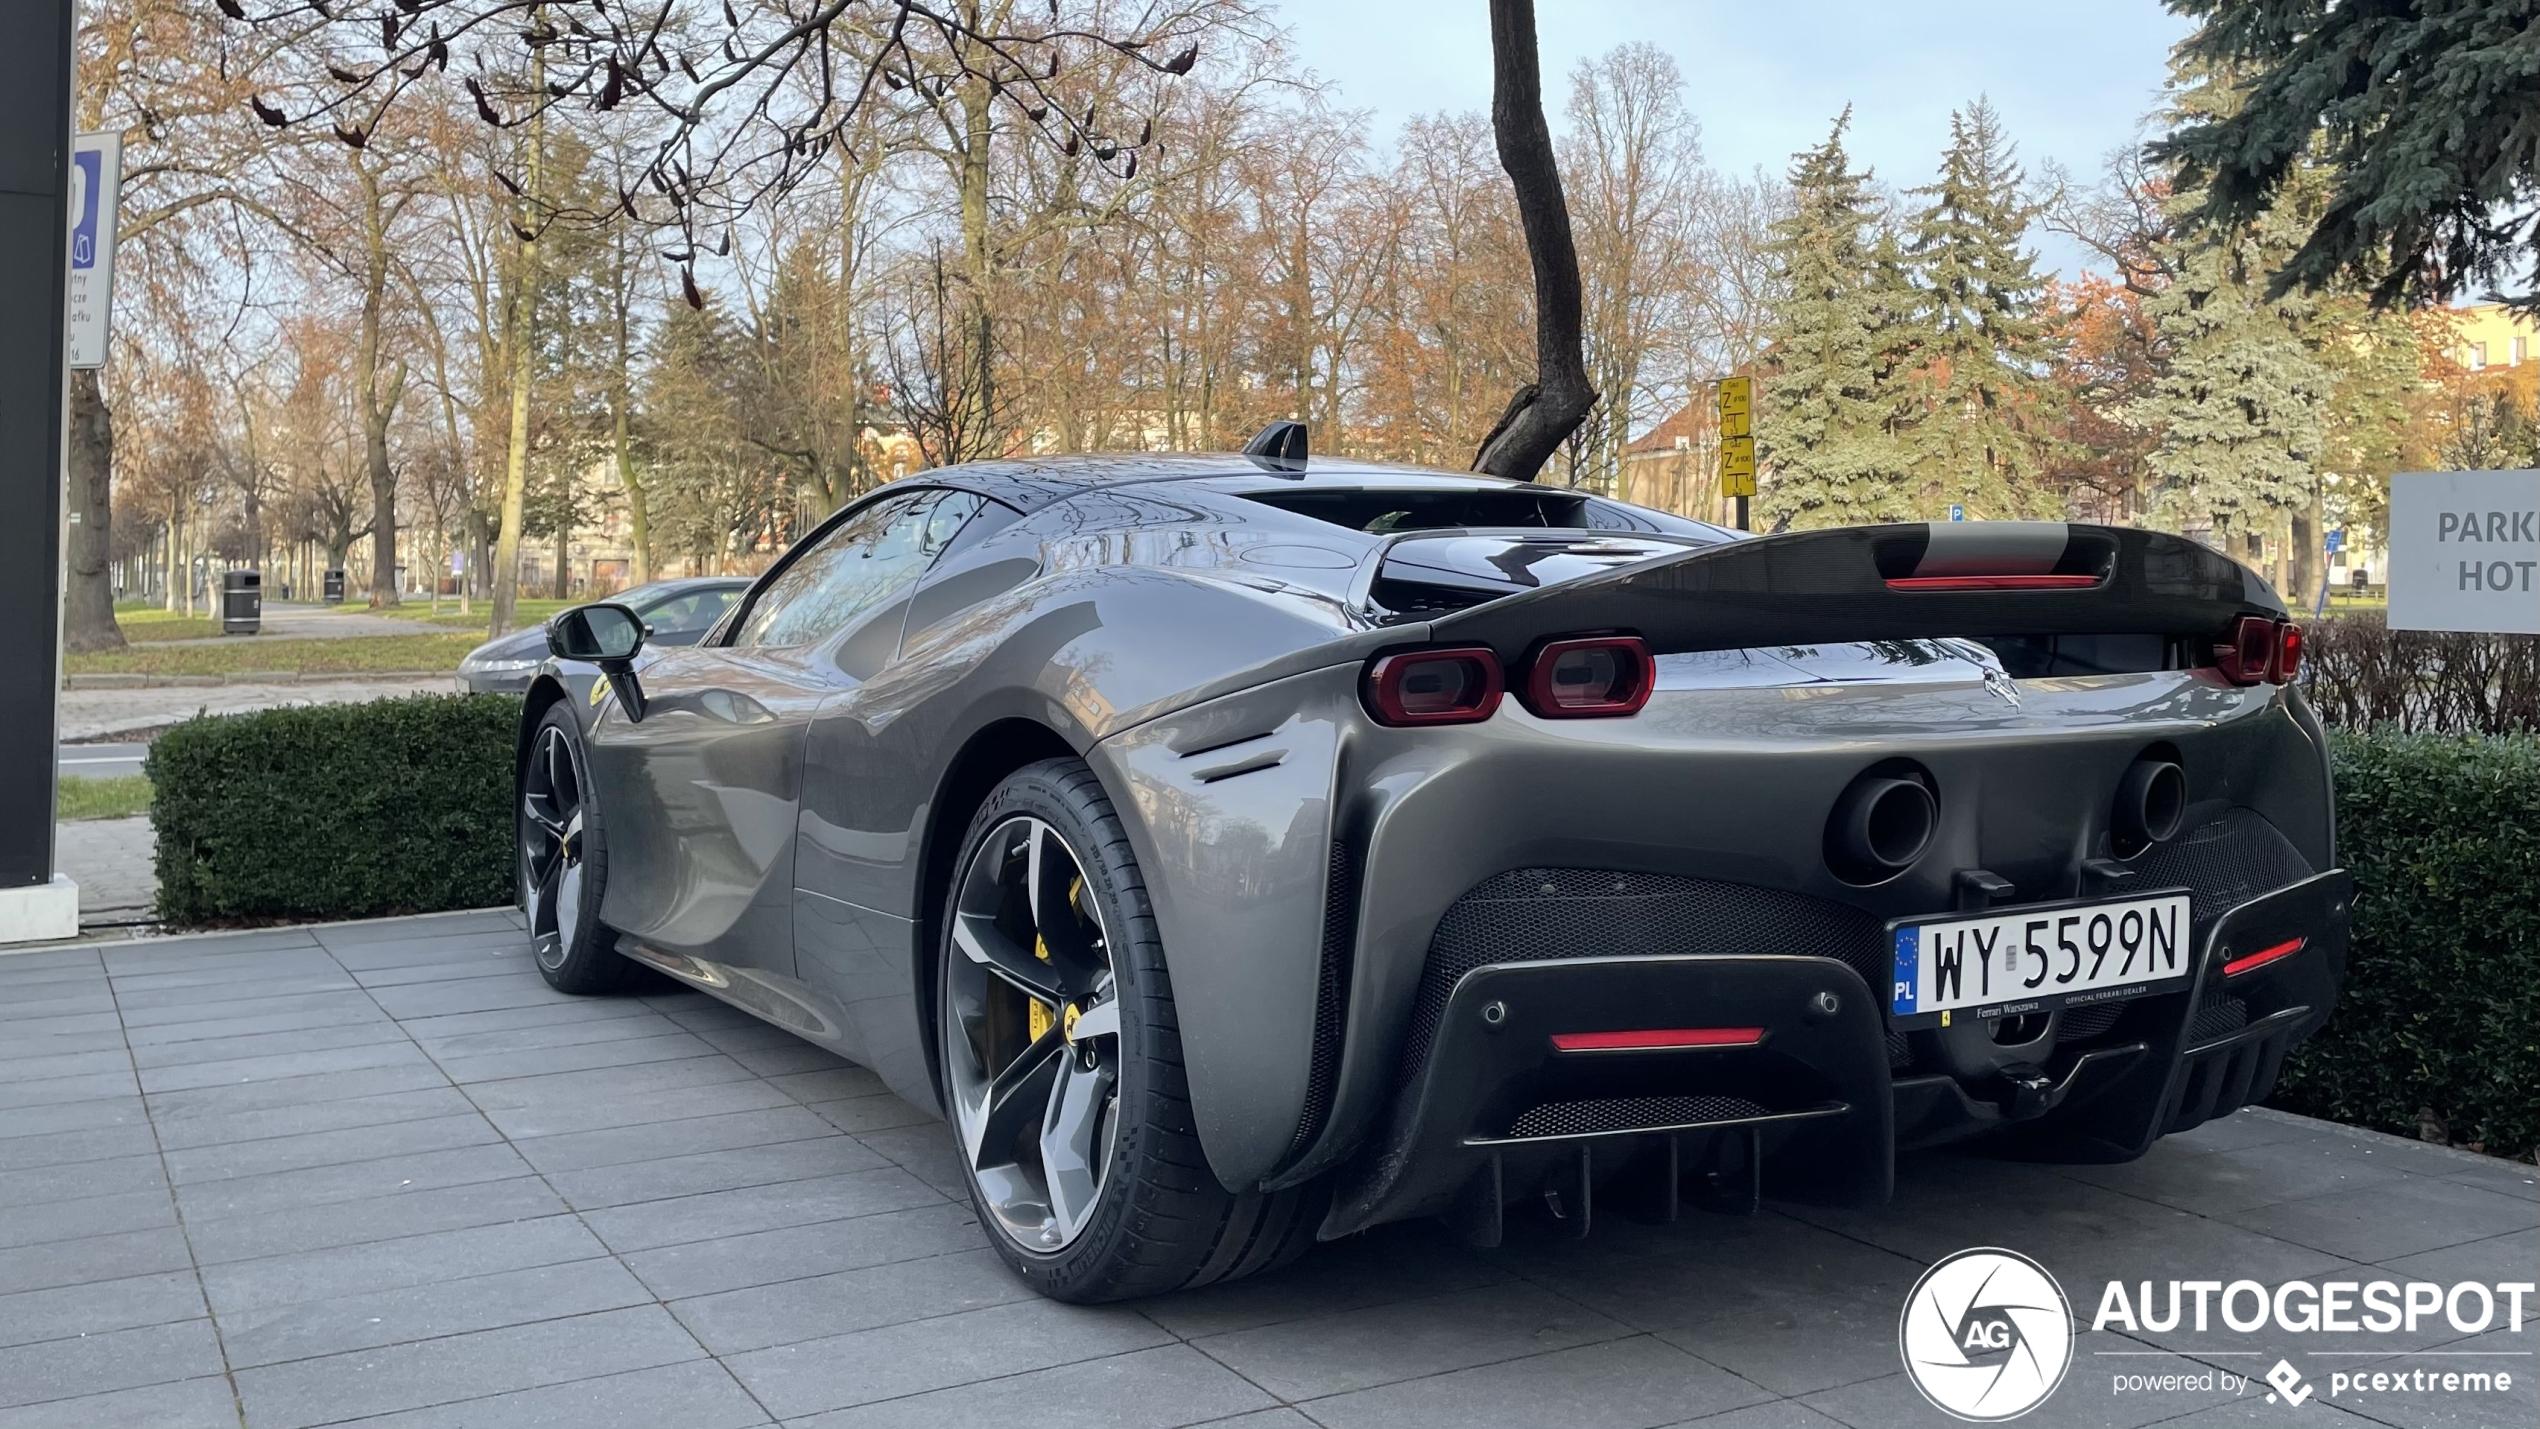 Poland received a Ferrari SF90 Stradale Assetto Fiorano